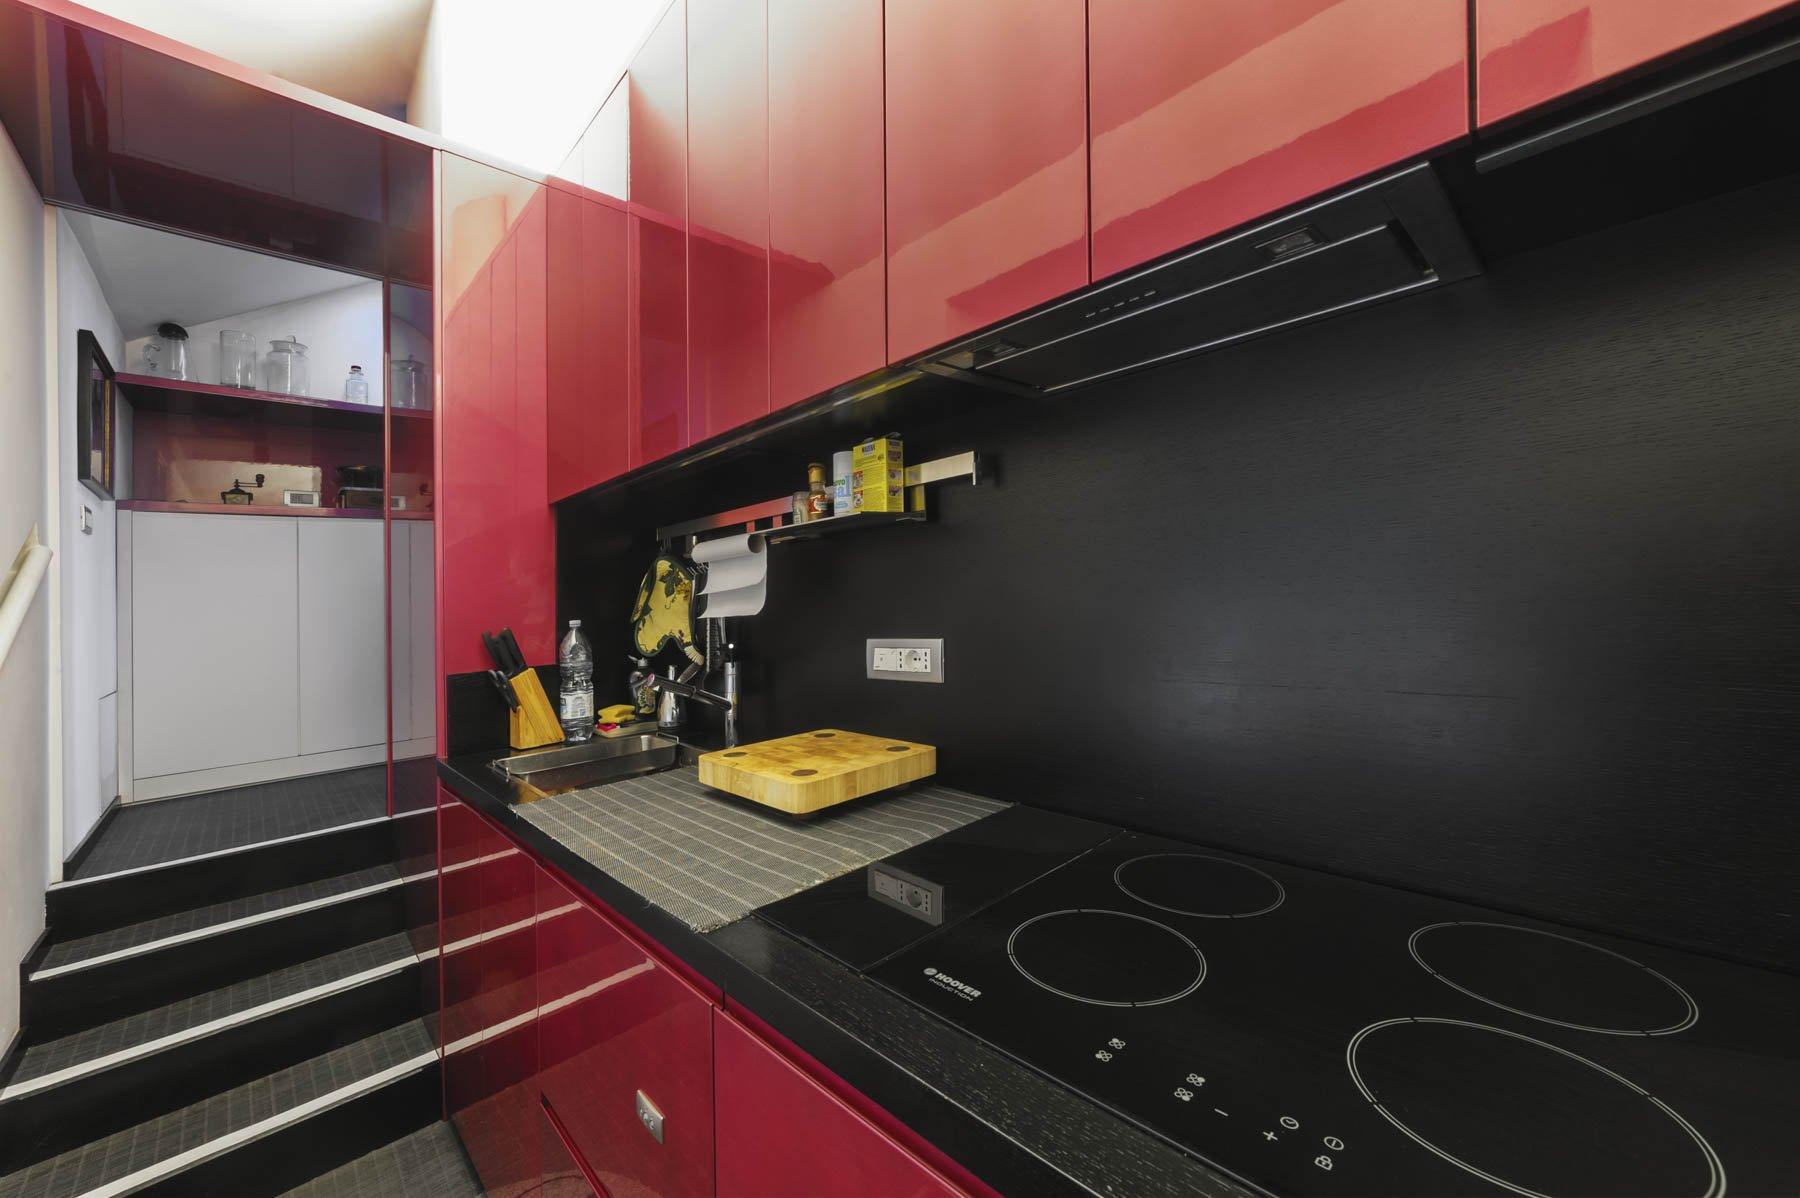 Apartment for sale in Baveno, inside a historic lake front villa - kitchen